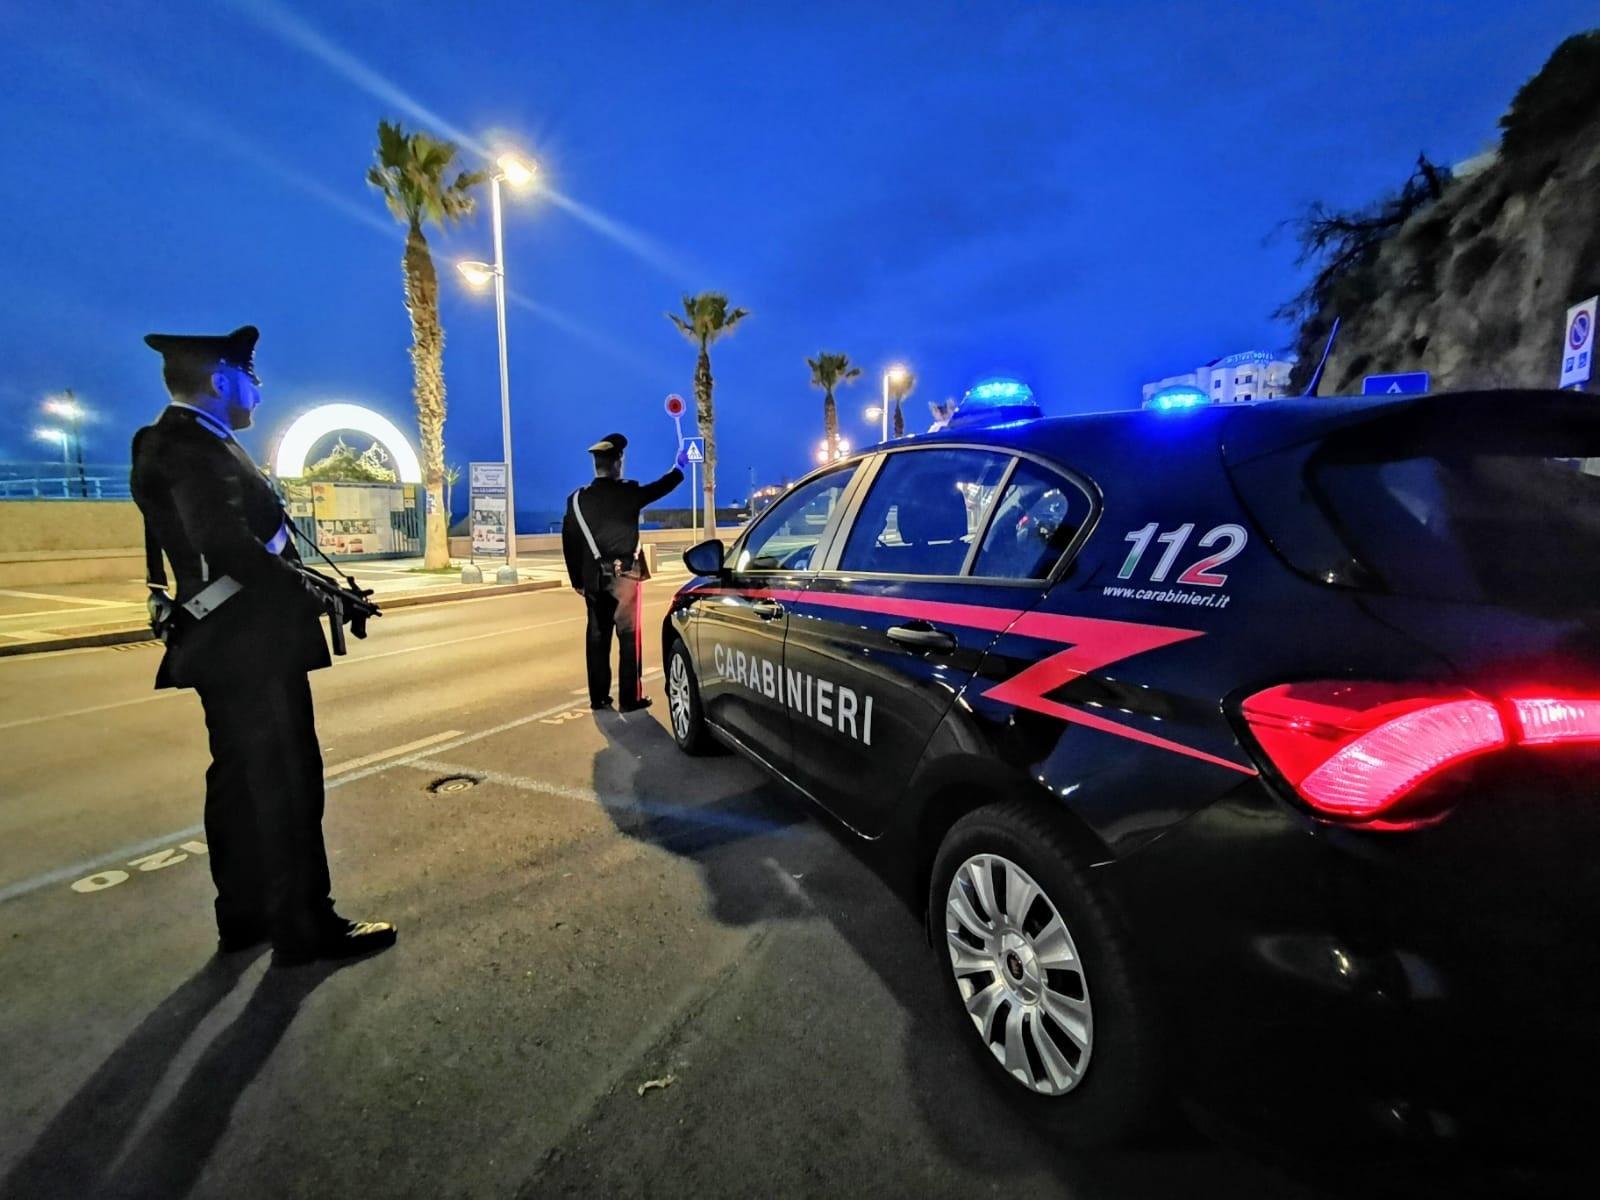 Smaltimento Rifiuti Sessa Aurunca nascondeva droga in auto, 46enne finisce in manette